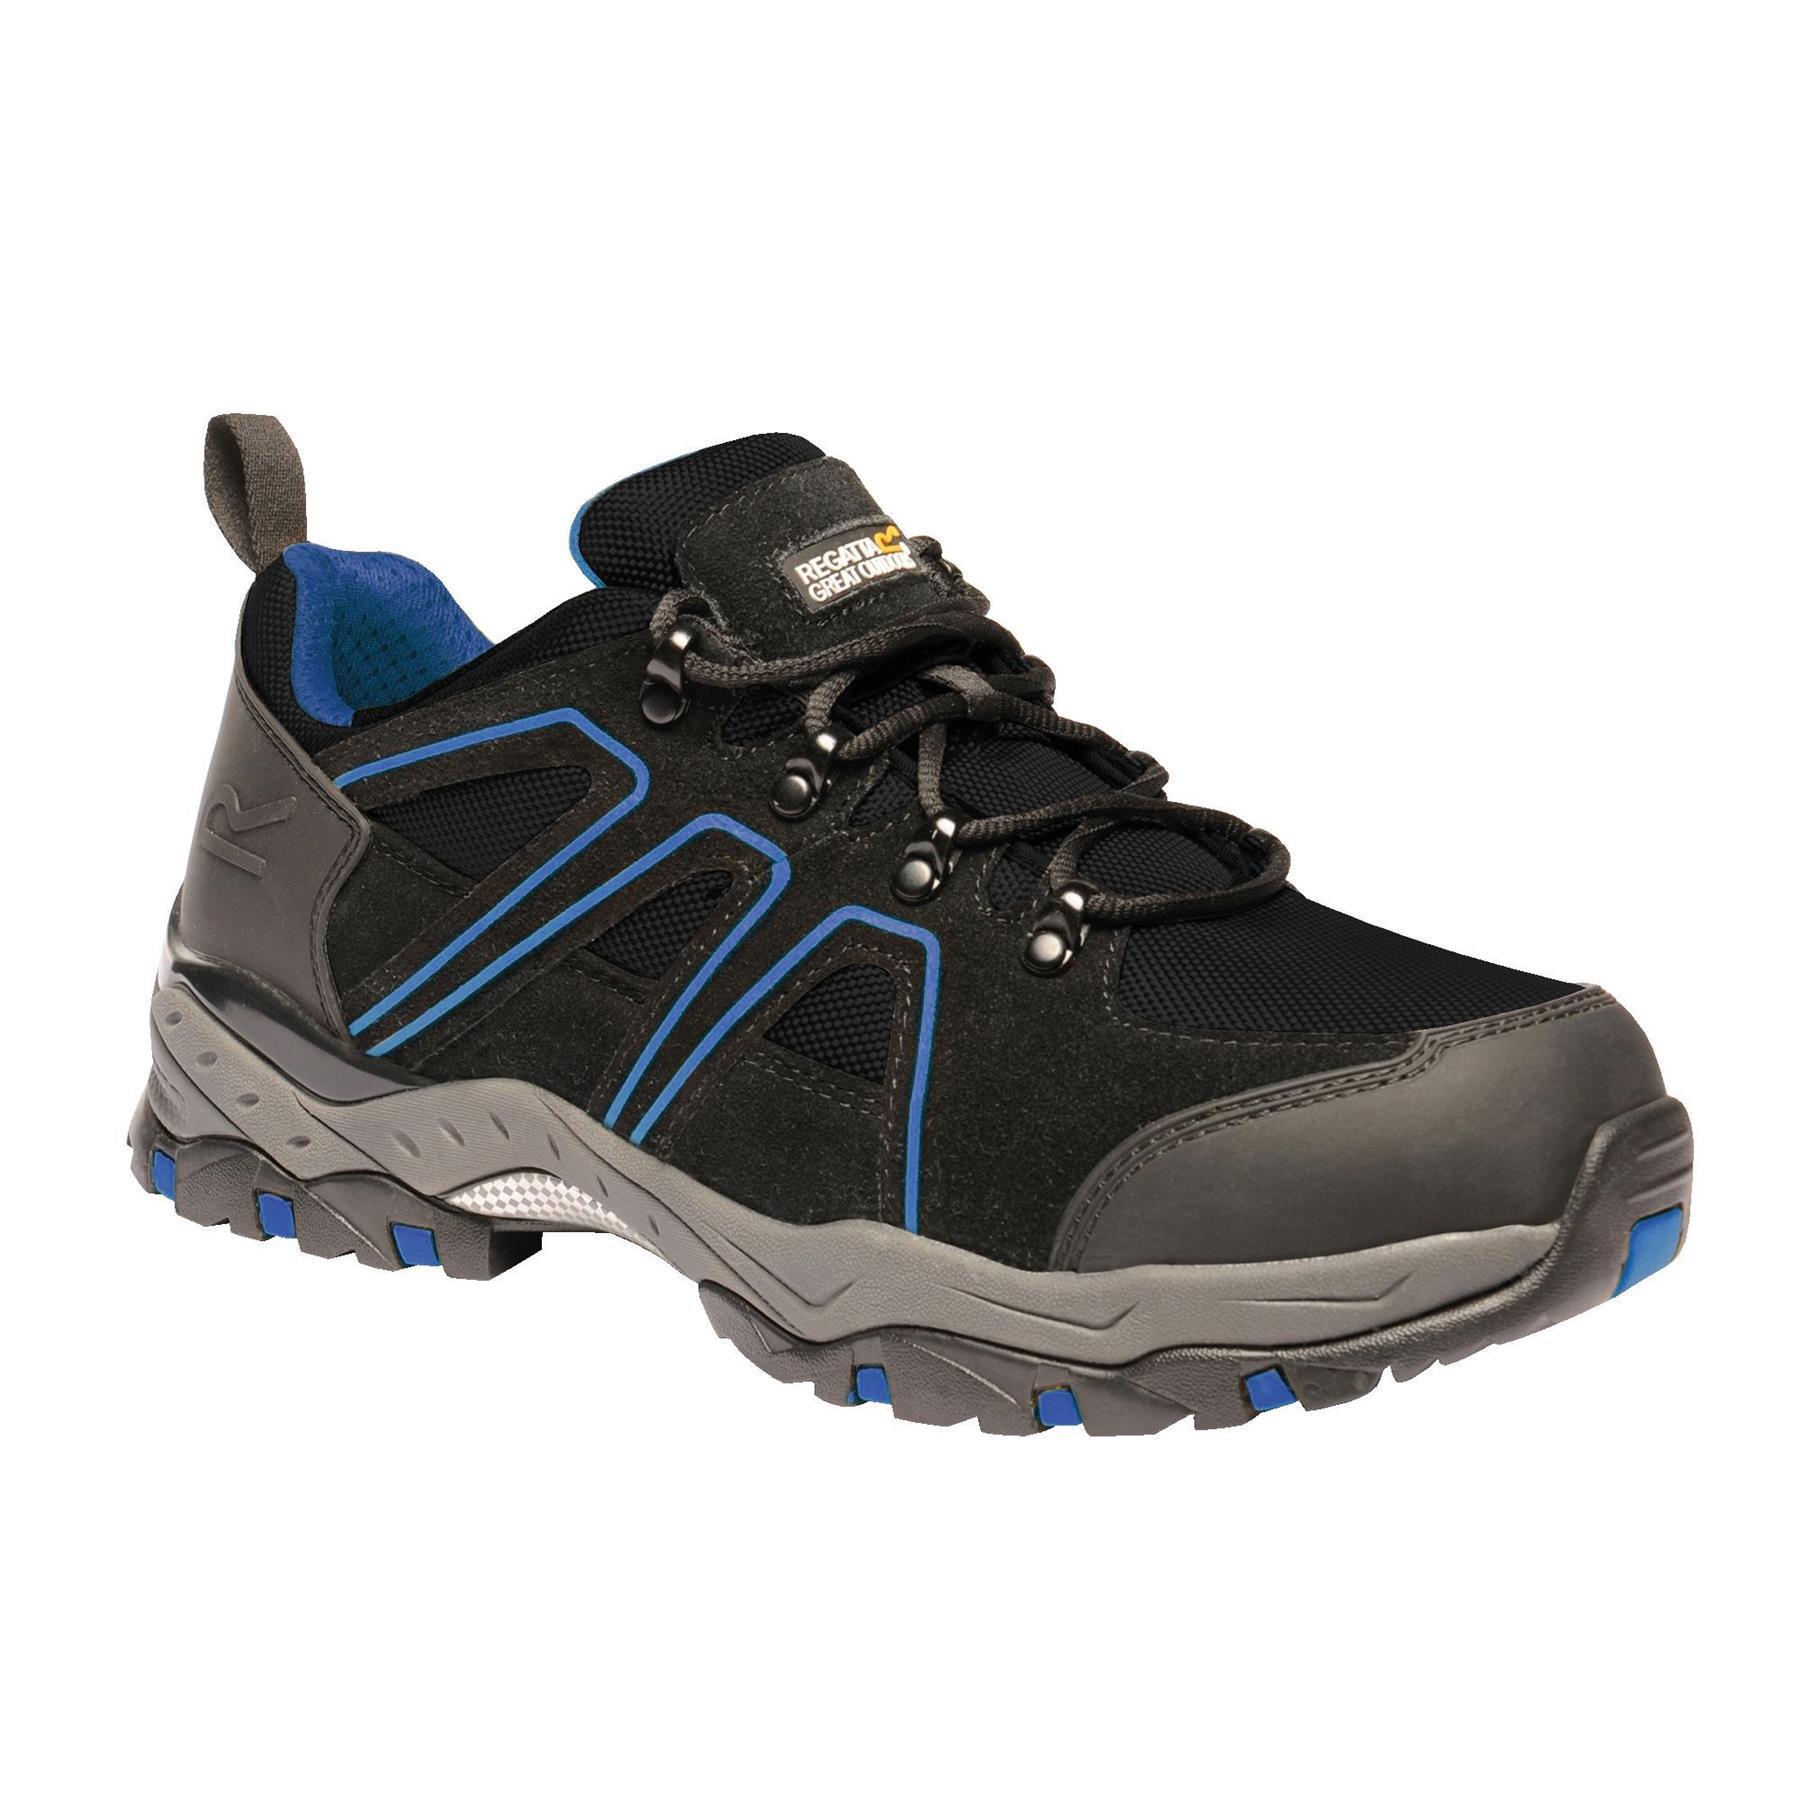 miniatuur 13 - Regatta Mens Work Safety Protective Shoes Steel Toe Cap Boots Workwear